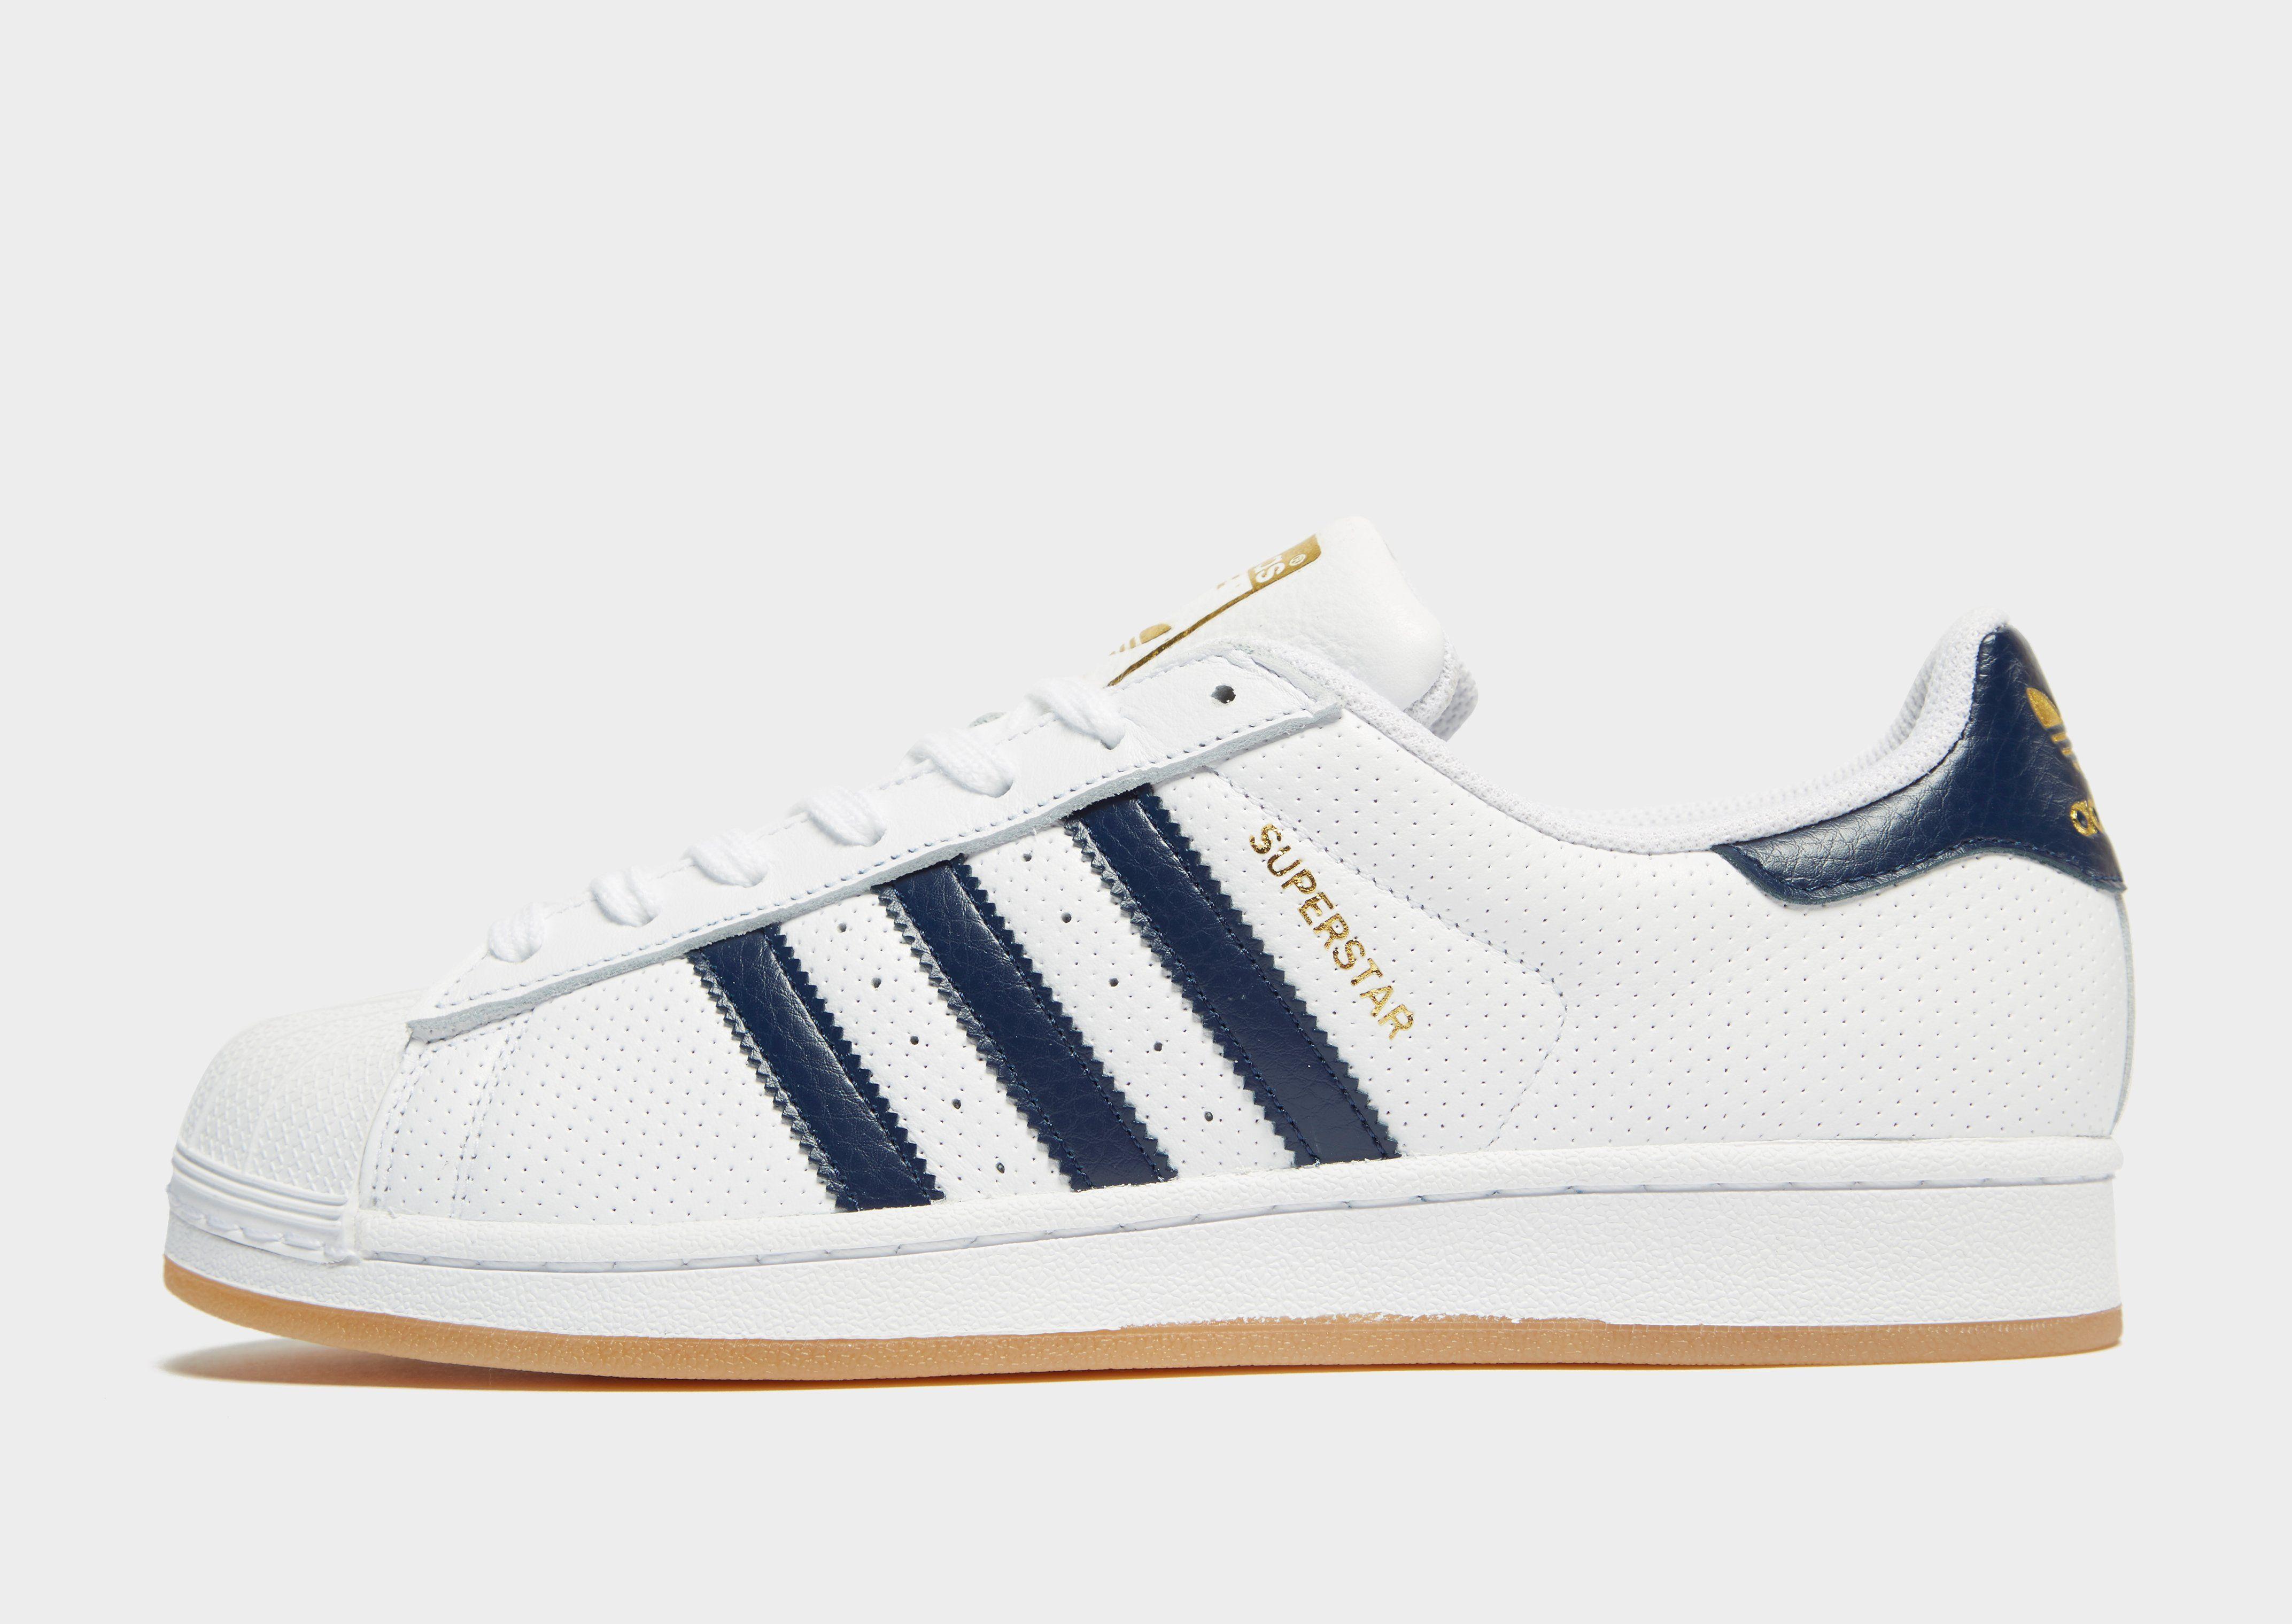 Originals Originals Sports HommeJd Superstar Superstar Adidas Adidas UMGzVqSp